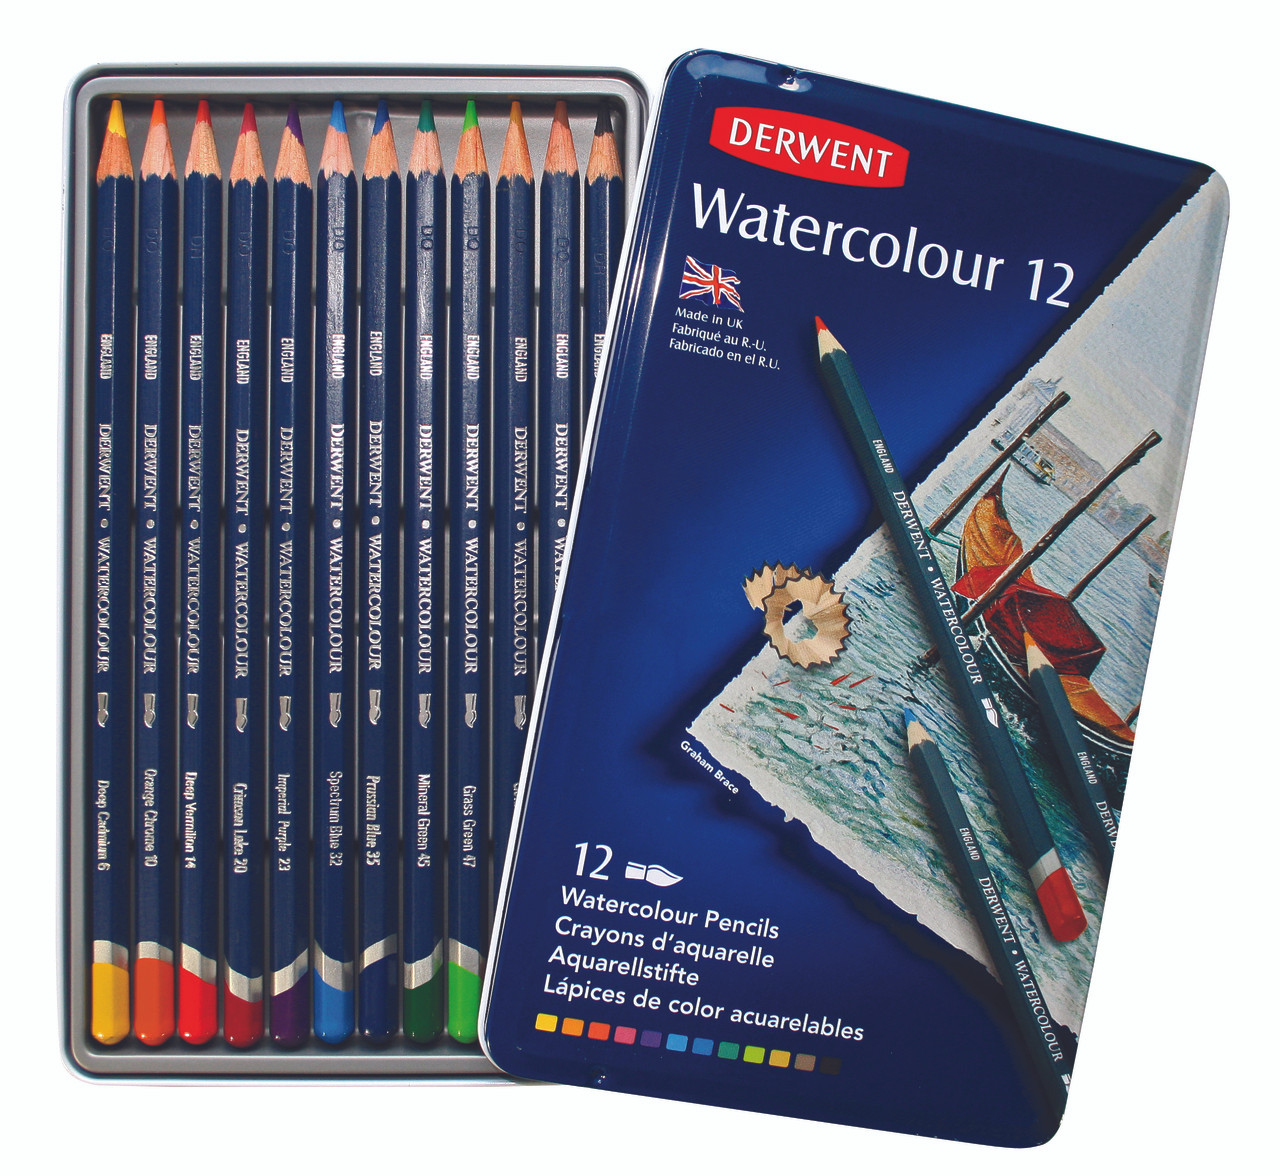 Derwent Watercolor Pencil 12pc Tin